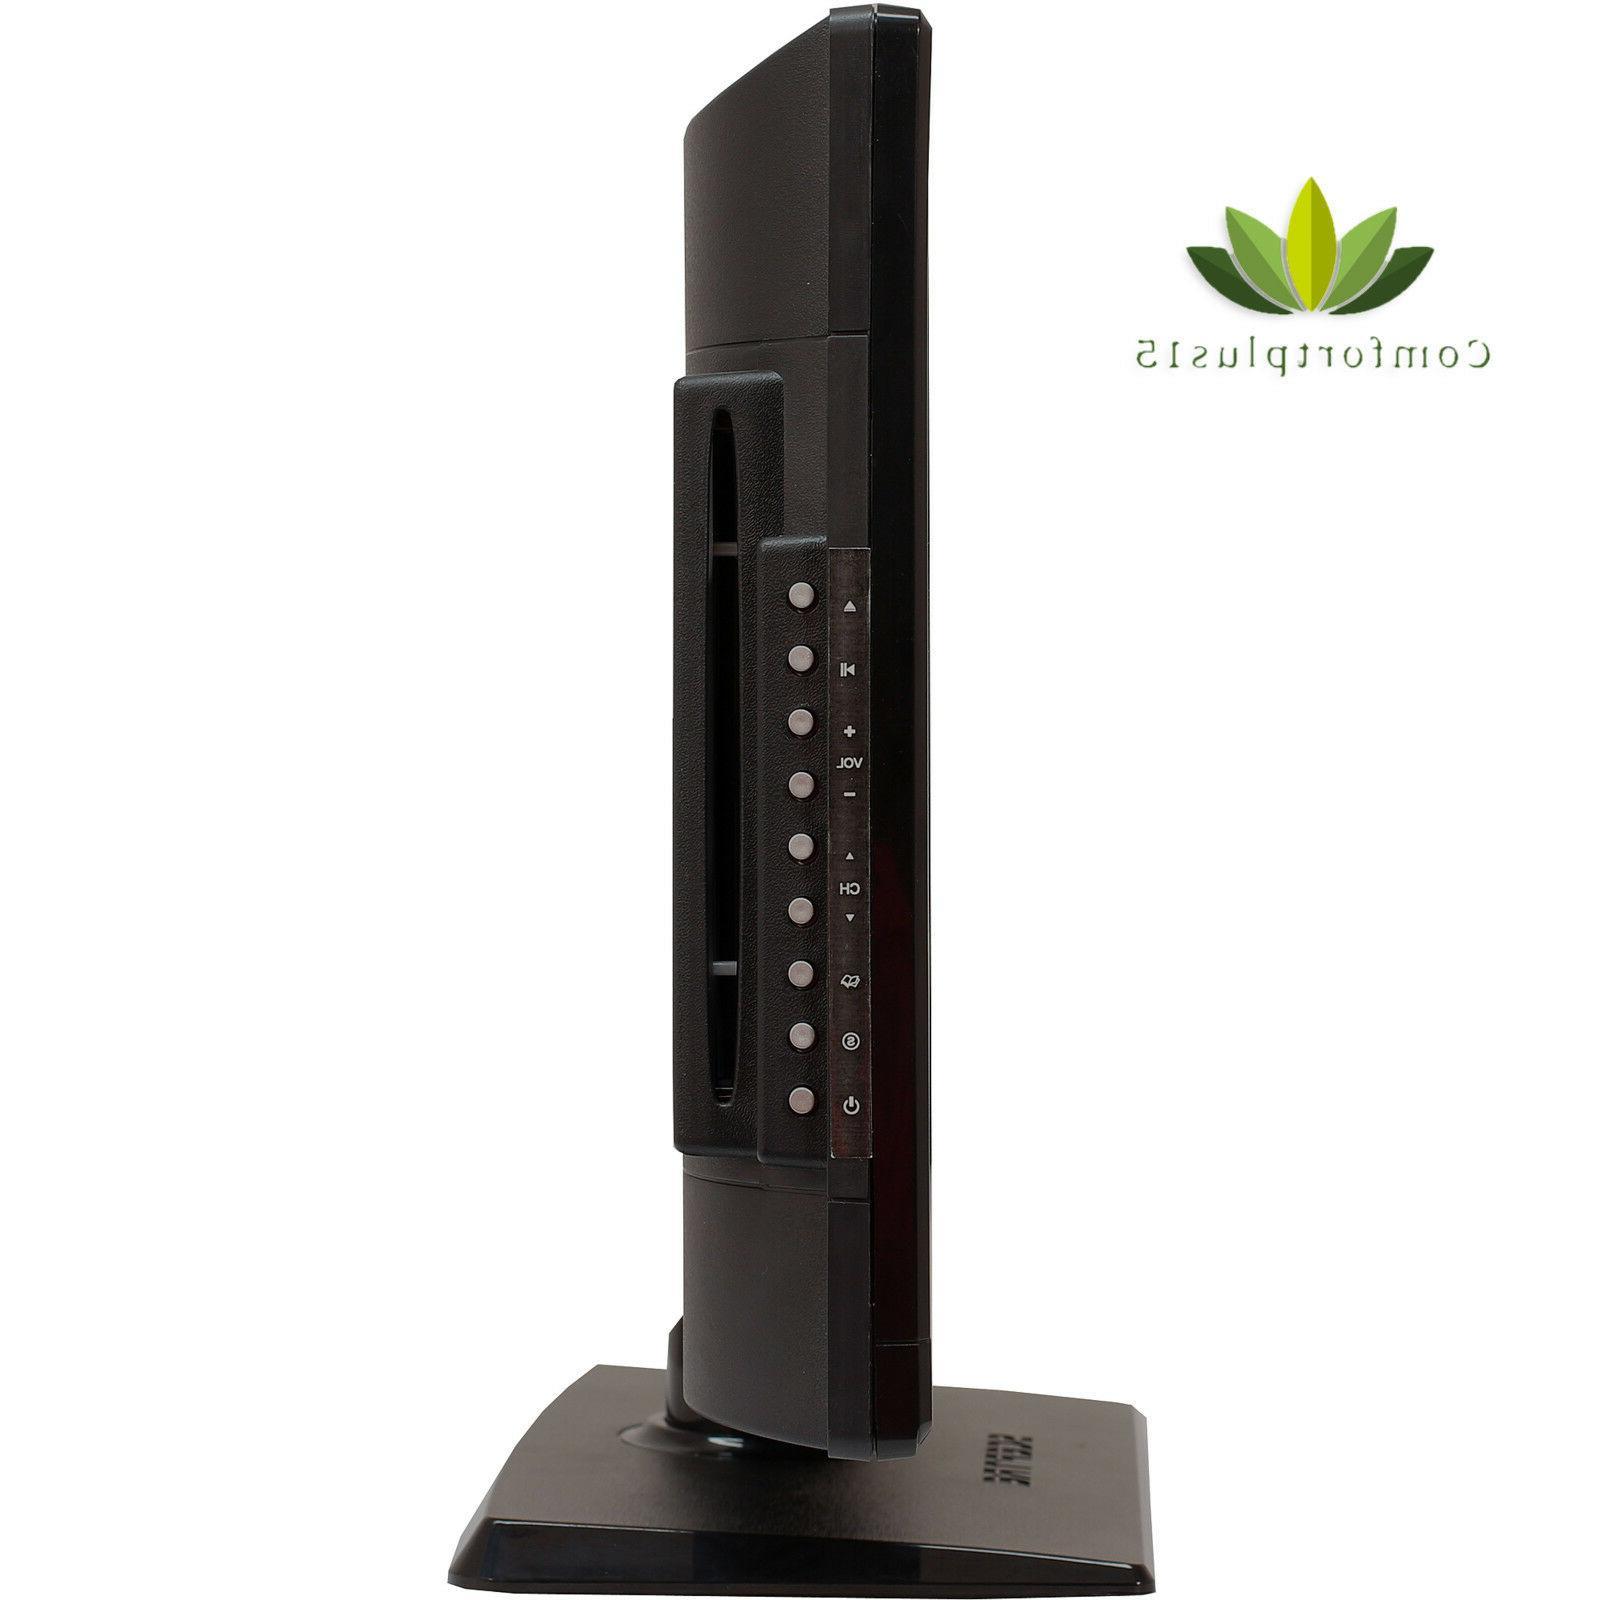 "Sceptre 19"" Class HD, LED - 720p, 60Hz with DVD"